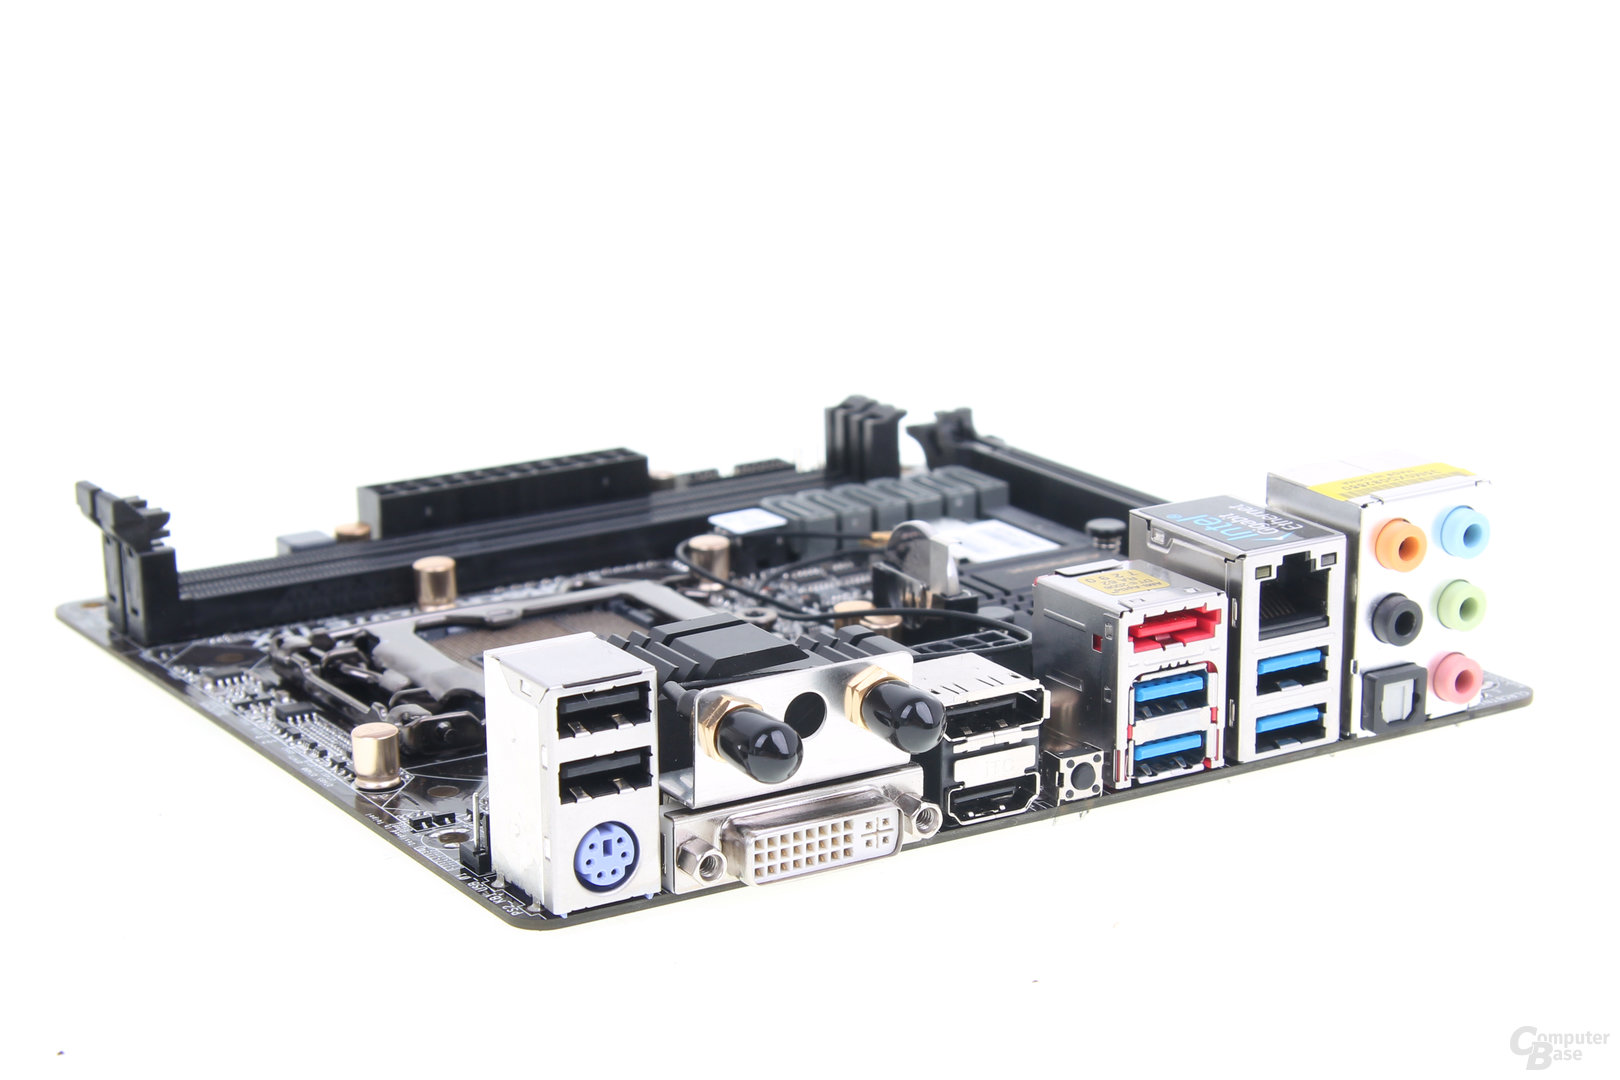 ASRock Z87E-ITX - Slotblende